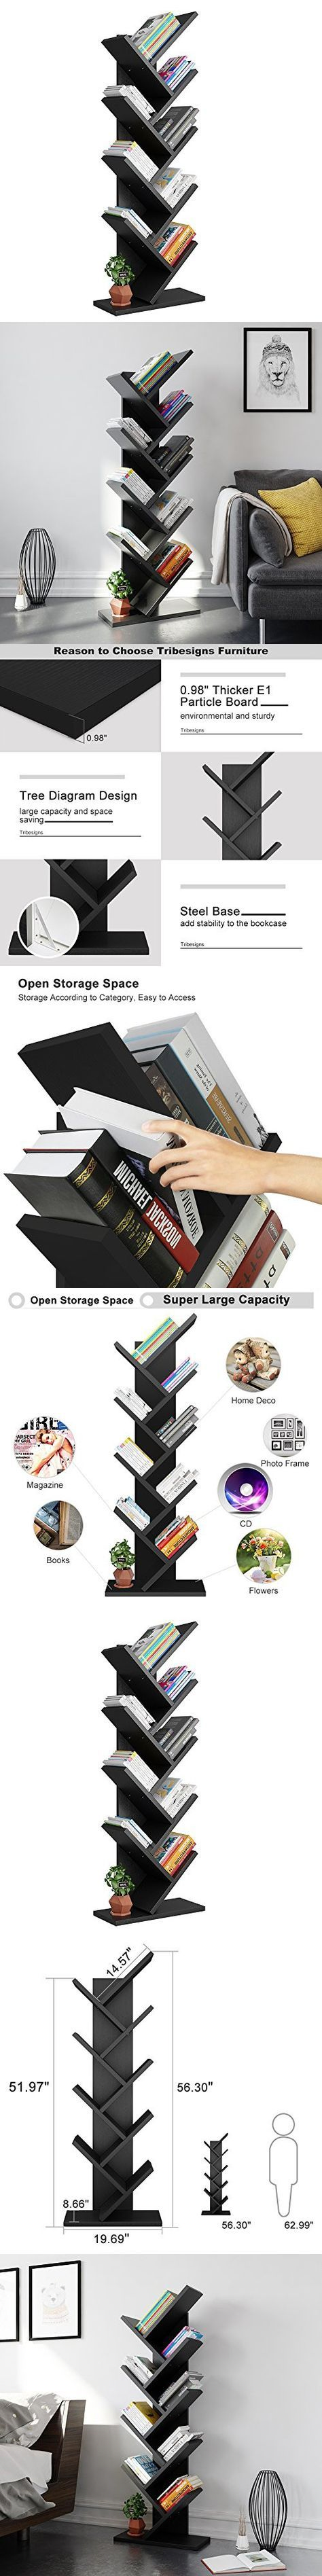 Tribesigns 9-Shelf Tree Shaped Bookcase Book Shelf Modern Stylish Kids Children Bookshelf Shelving Display Storage Rack for CD